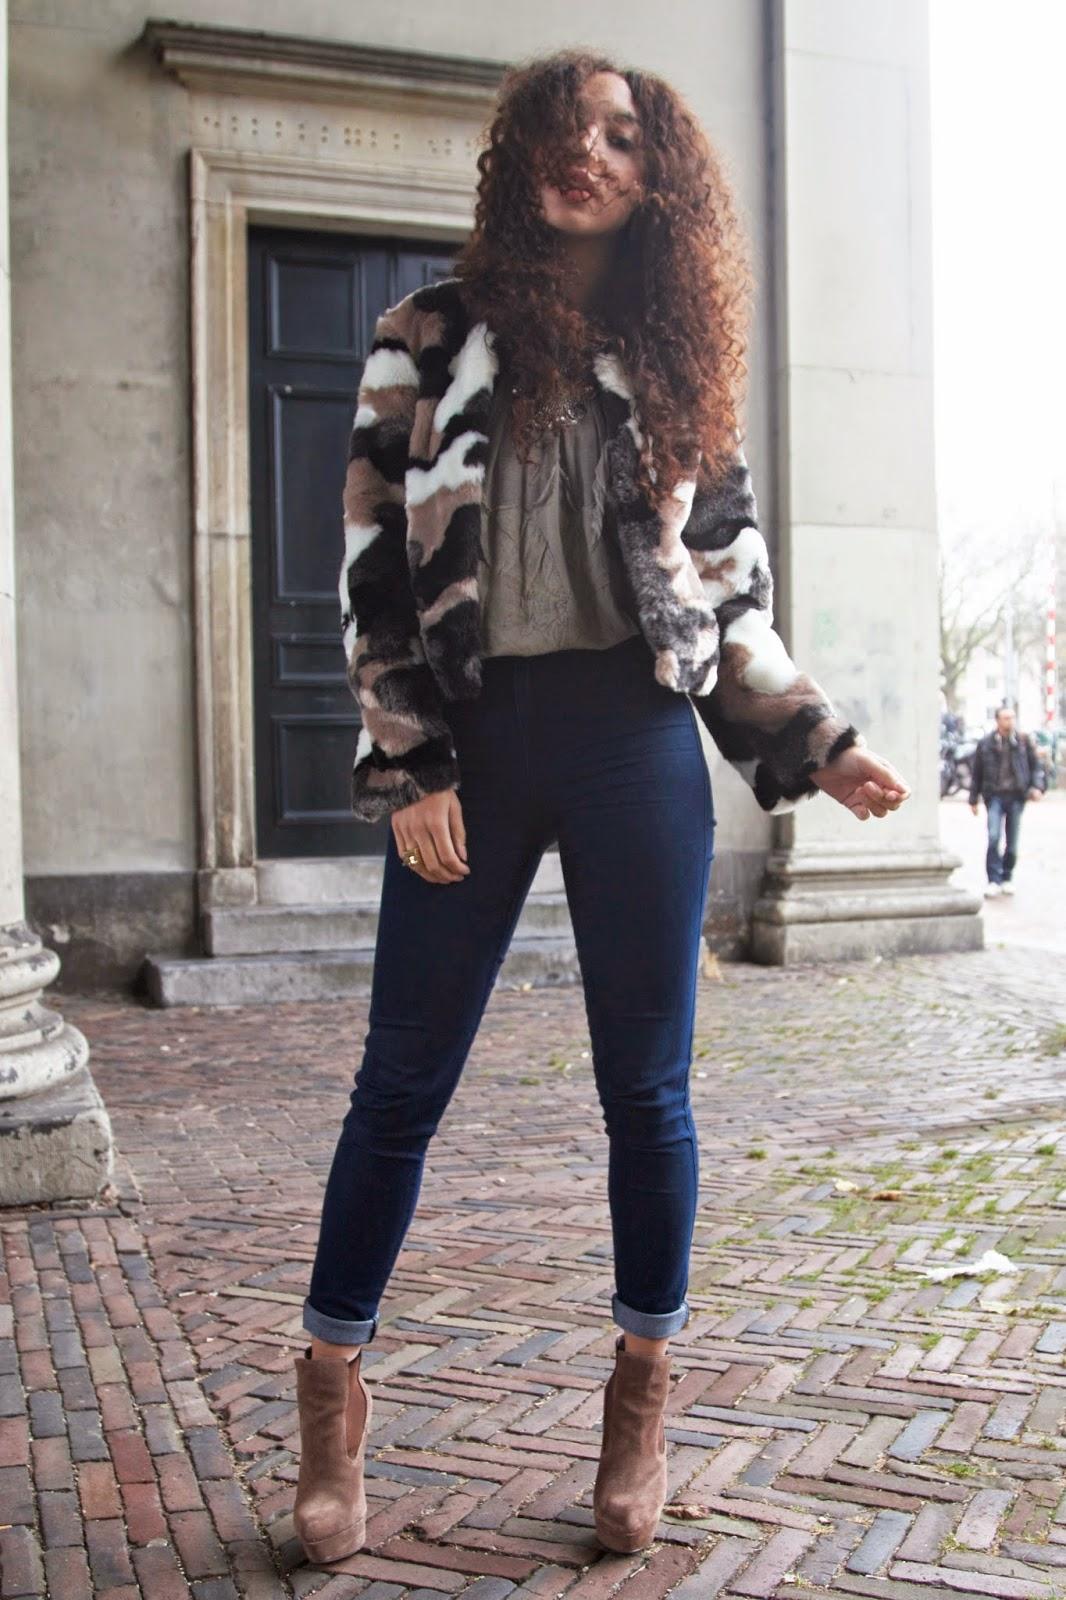 5 reasons to wear fur coats